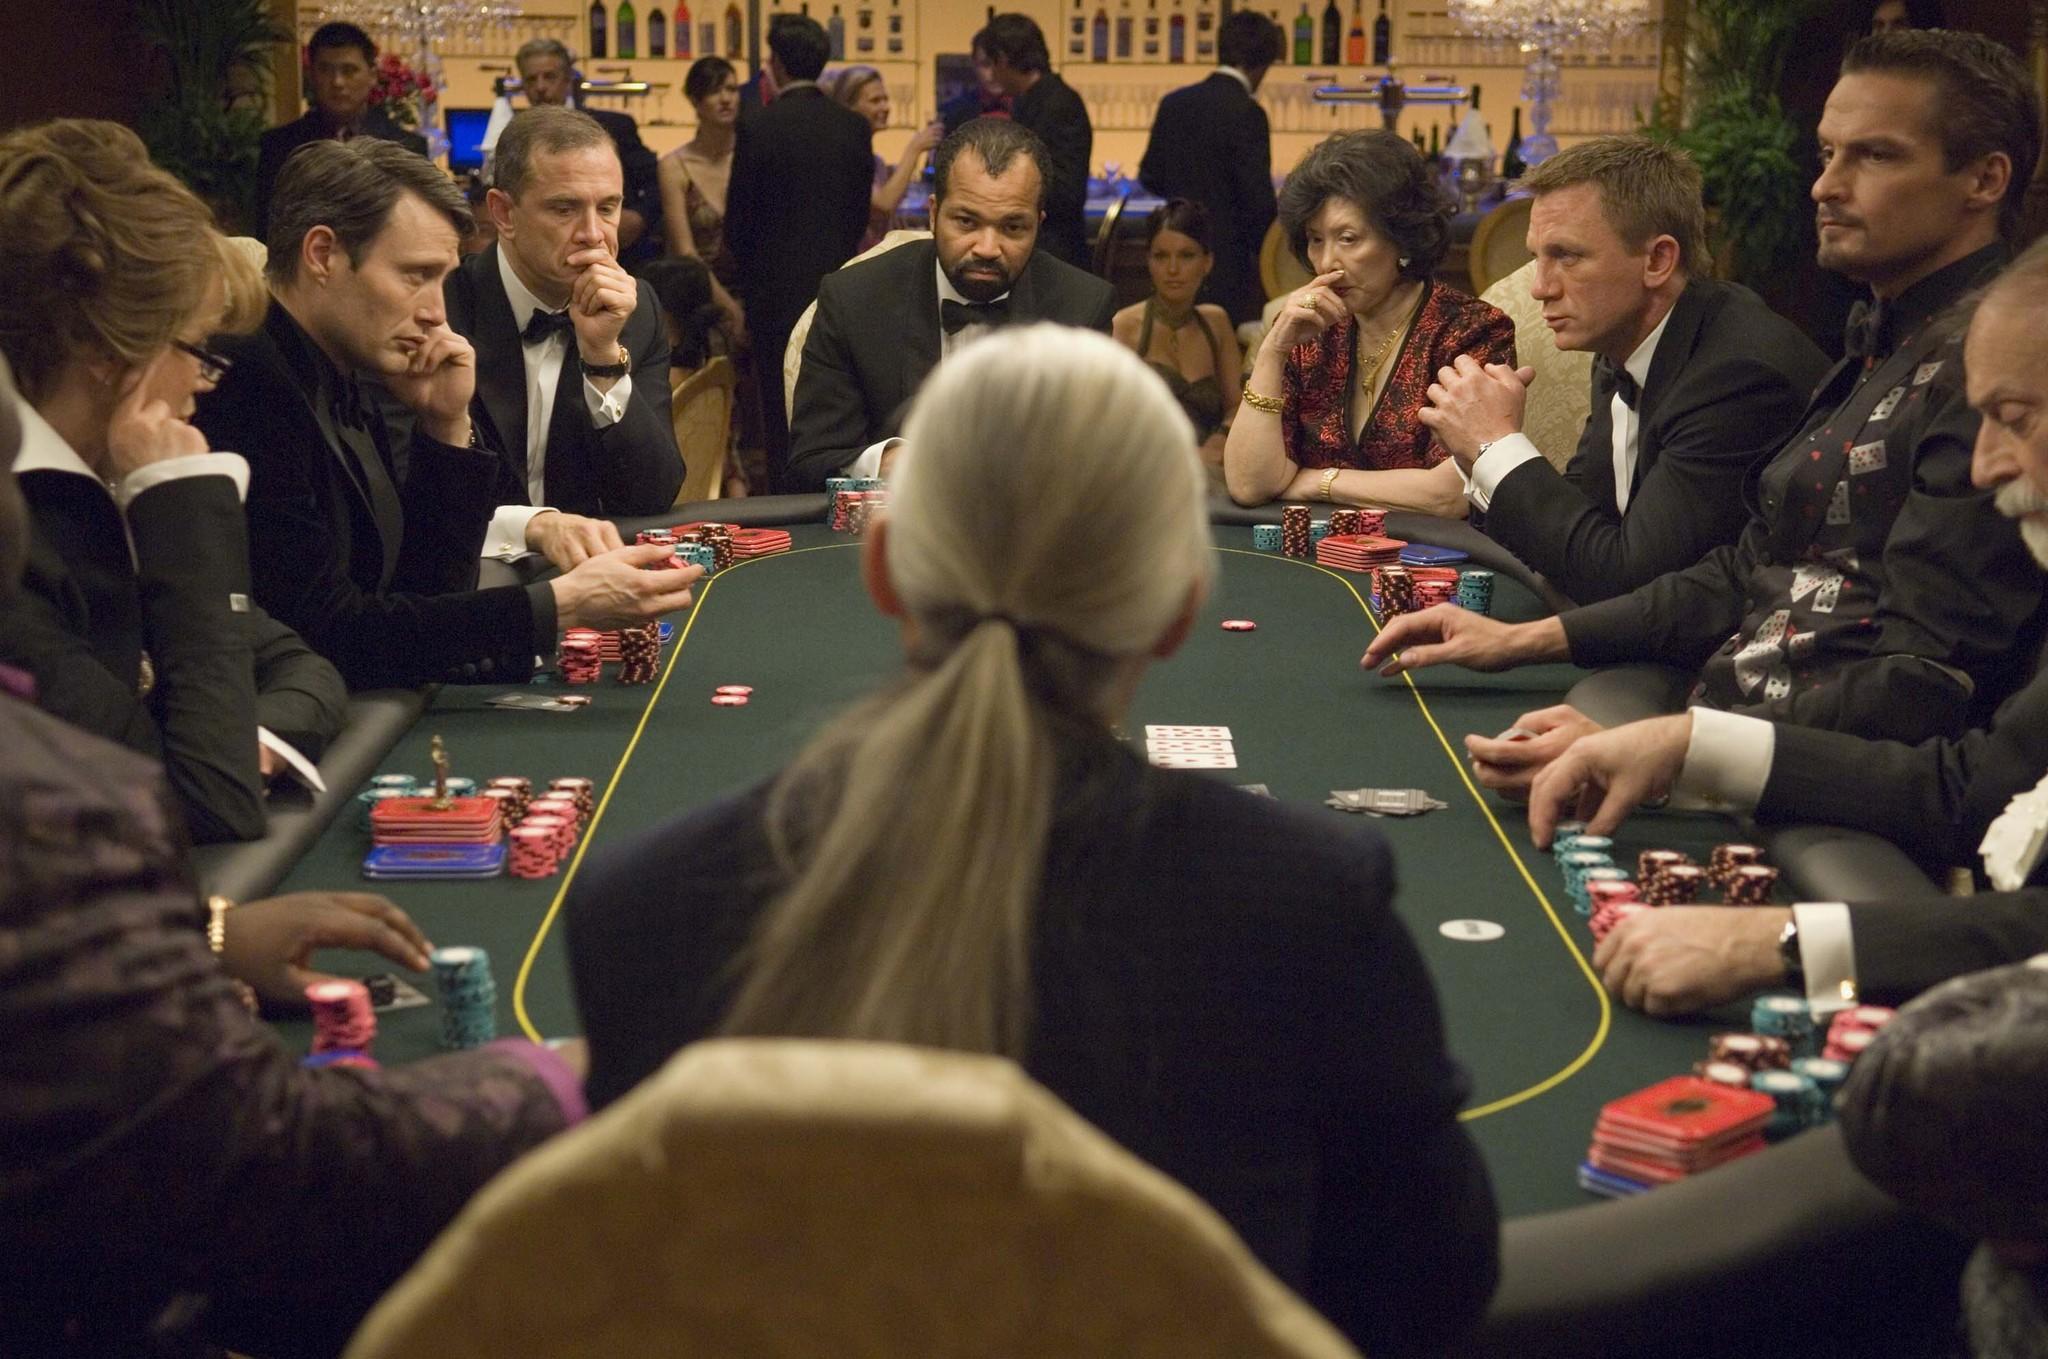 casino royale action scene